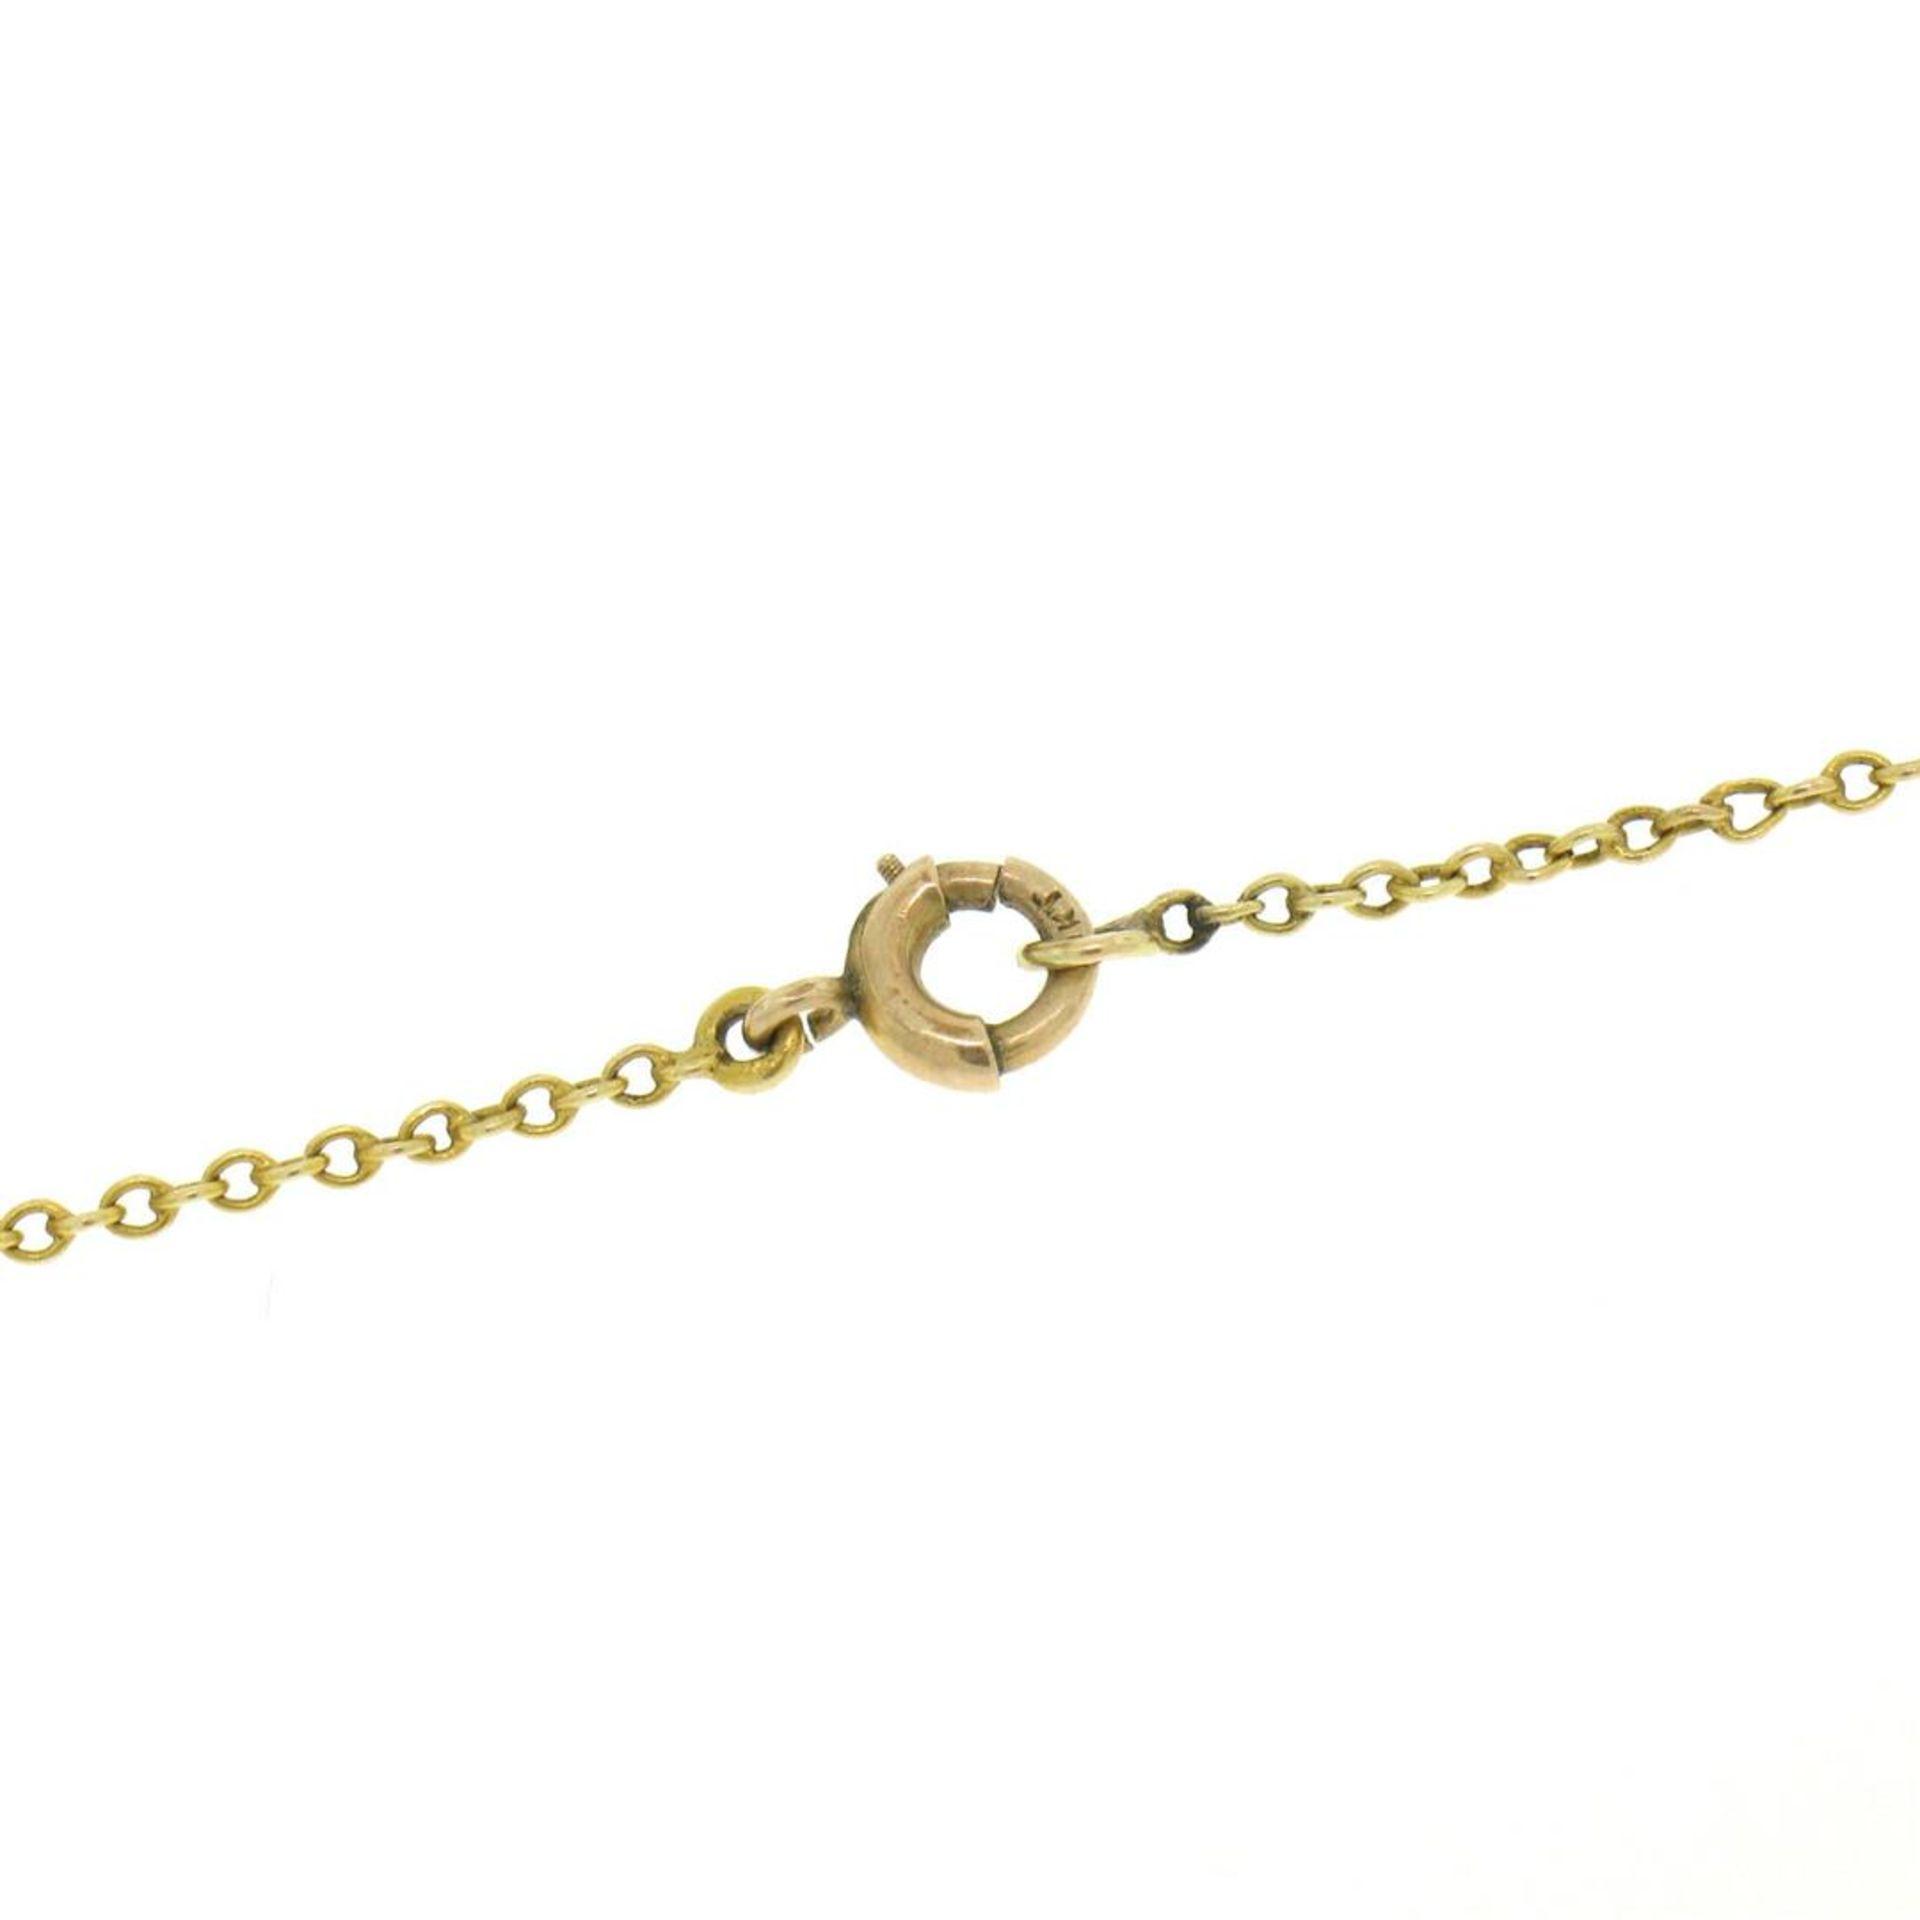 14k Gold Cushion Mine Cut Diamond Lavalier Pendant - Image 6 of 7